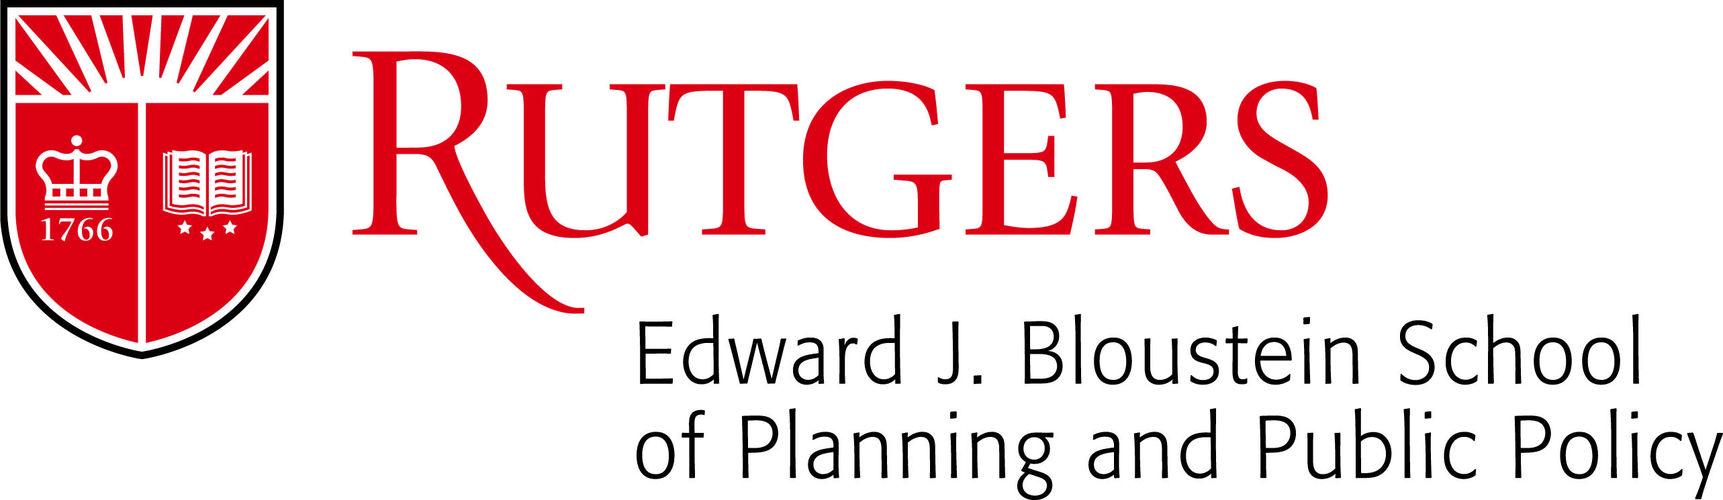 Edward J. Bloustein School of Planning and Public Policy, Rutgers University--New Brunswick